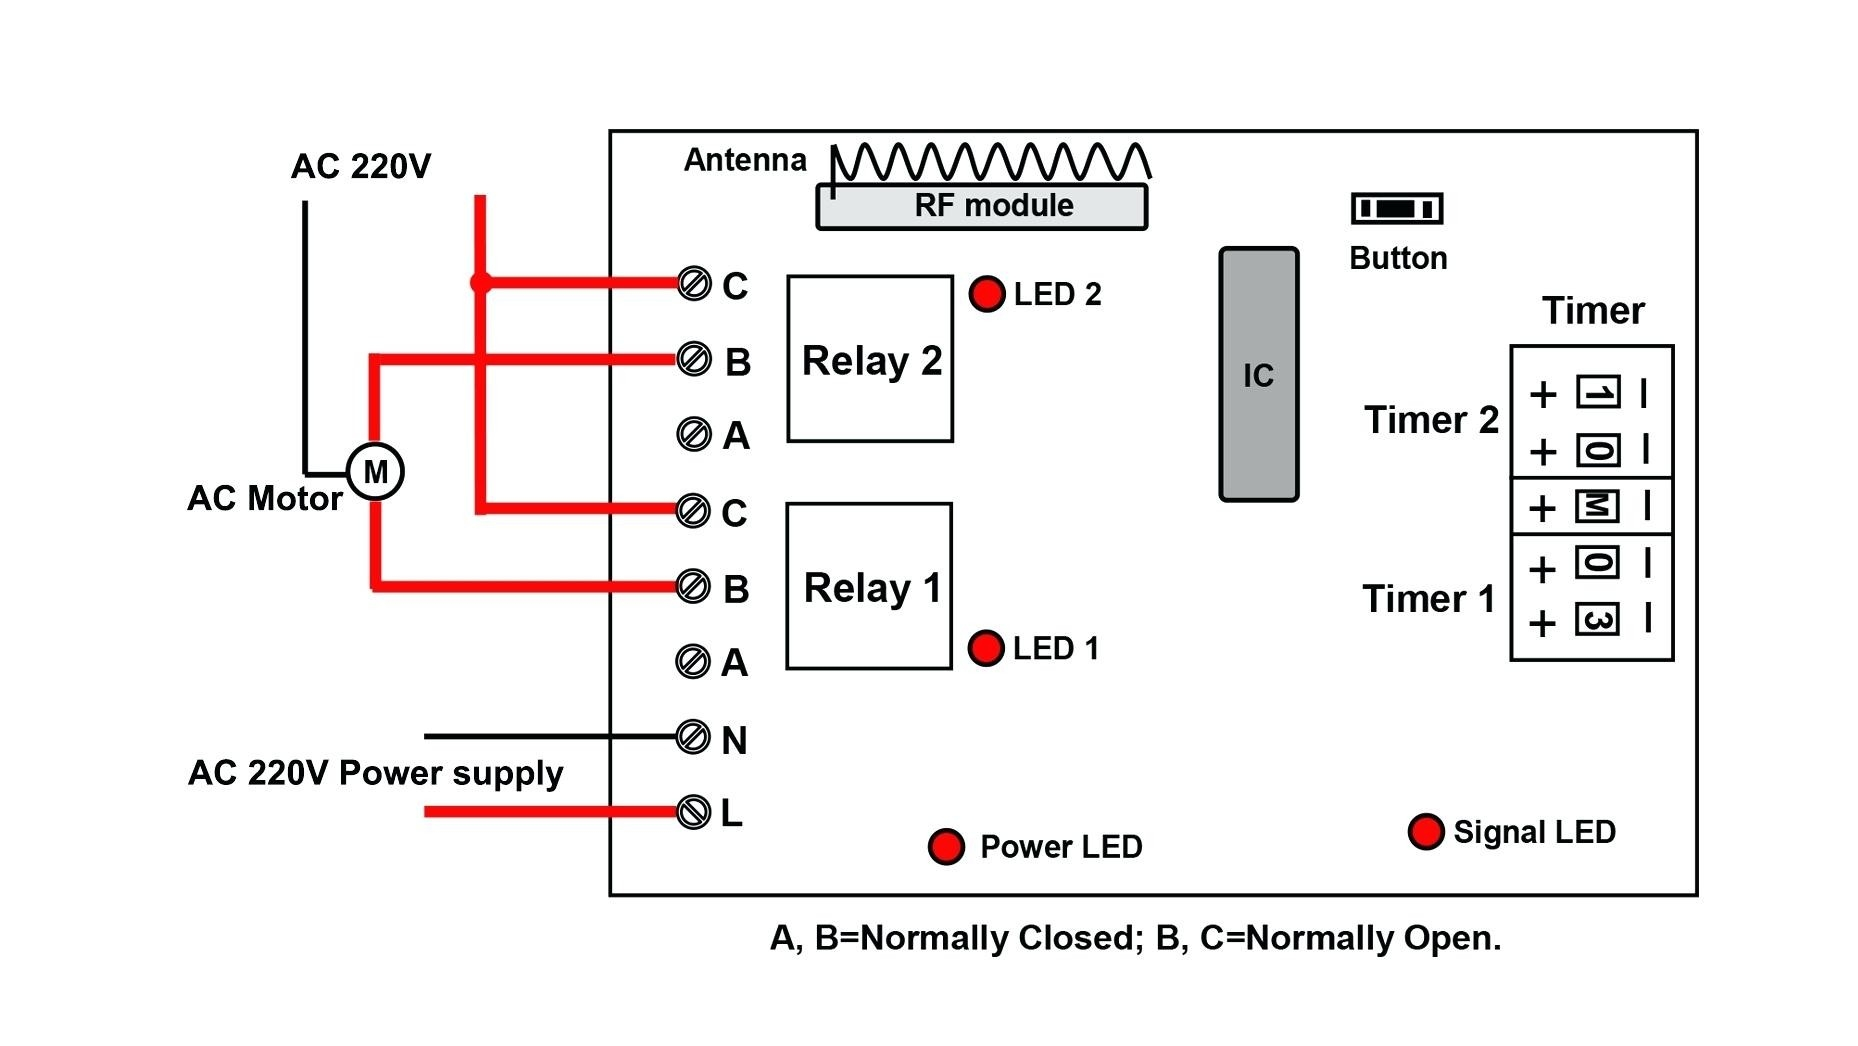 gould motor wiring diagram | free wiring diagram gould motor wiring diagram leeson motor wiring diagram for boat lift motor #8